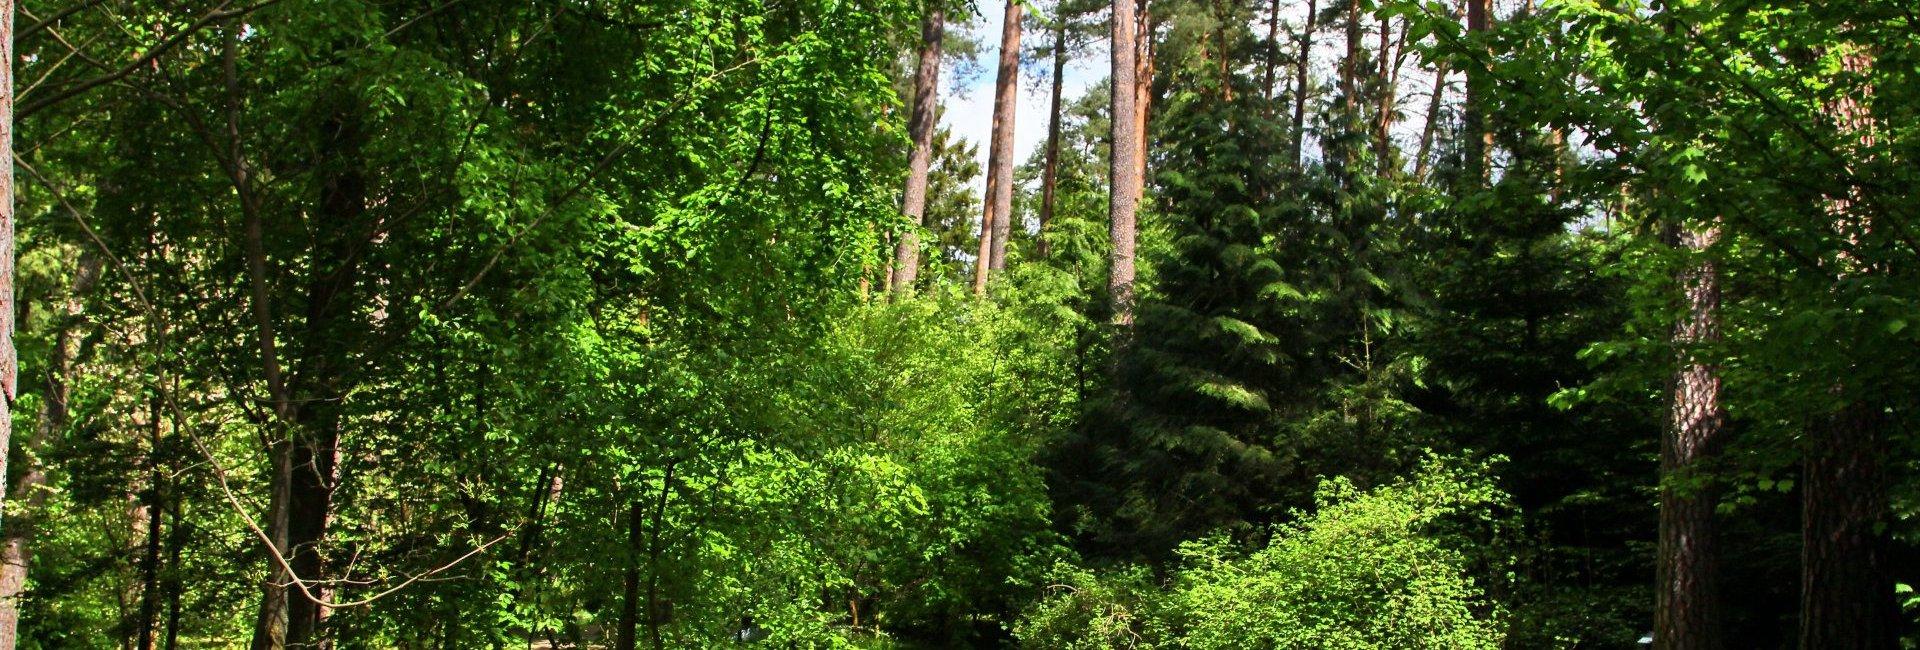 The forest arboretum of Warmia and Mazury in Kudypy (15 km od hotelu)